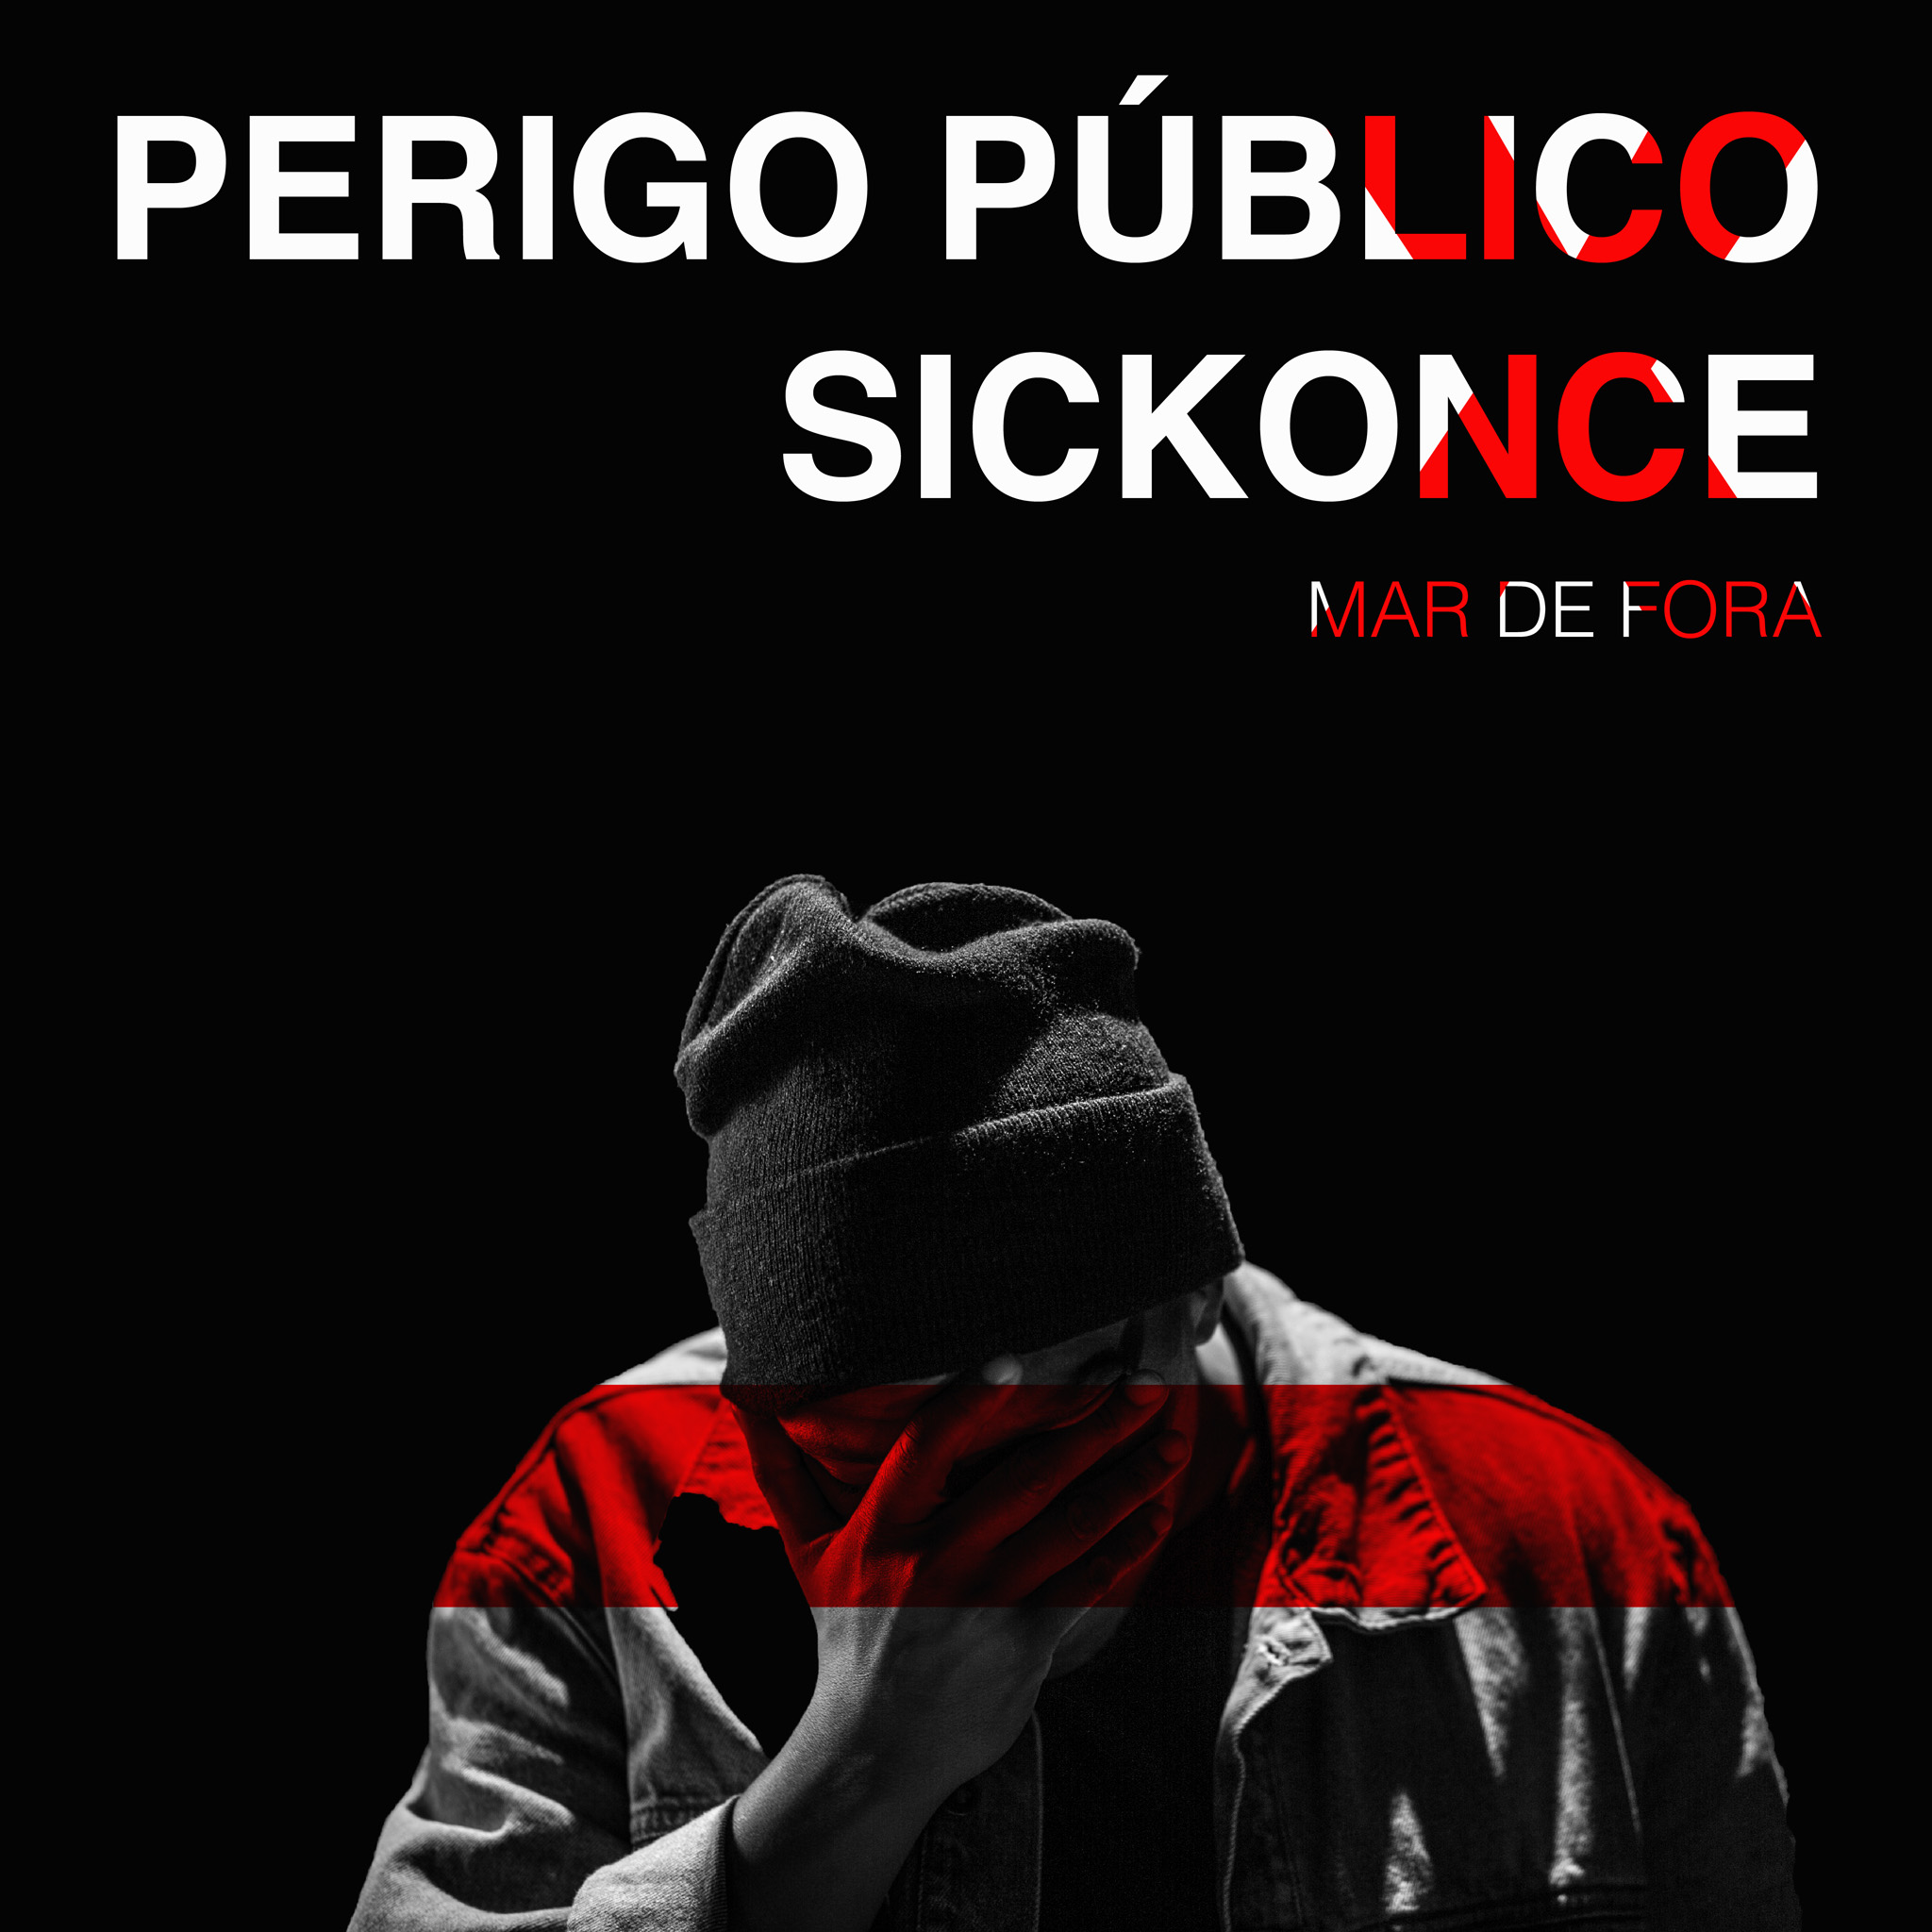 PERIGO PÚBLICO X SICKONCE - Mar de Fora (NOVO VÍDEO)